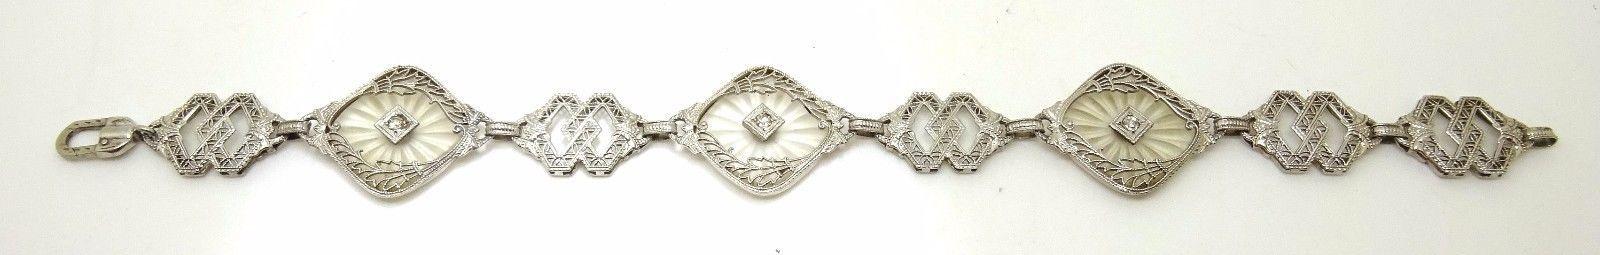 10k Gold Art Deco Filigree Bracelet with Genuine Natural Diamonds (#J3575)